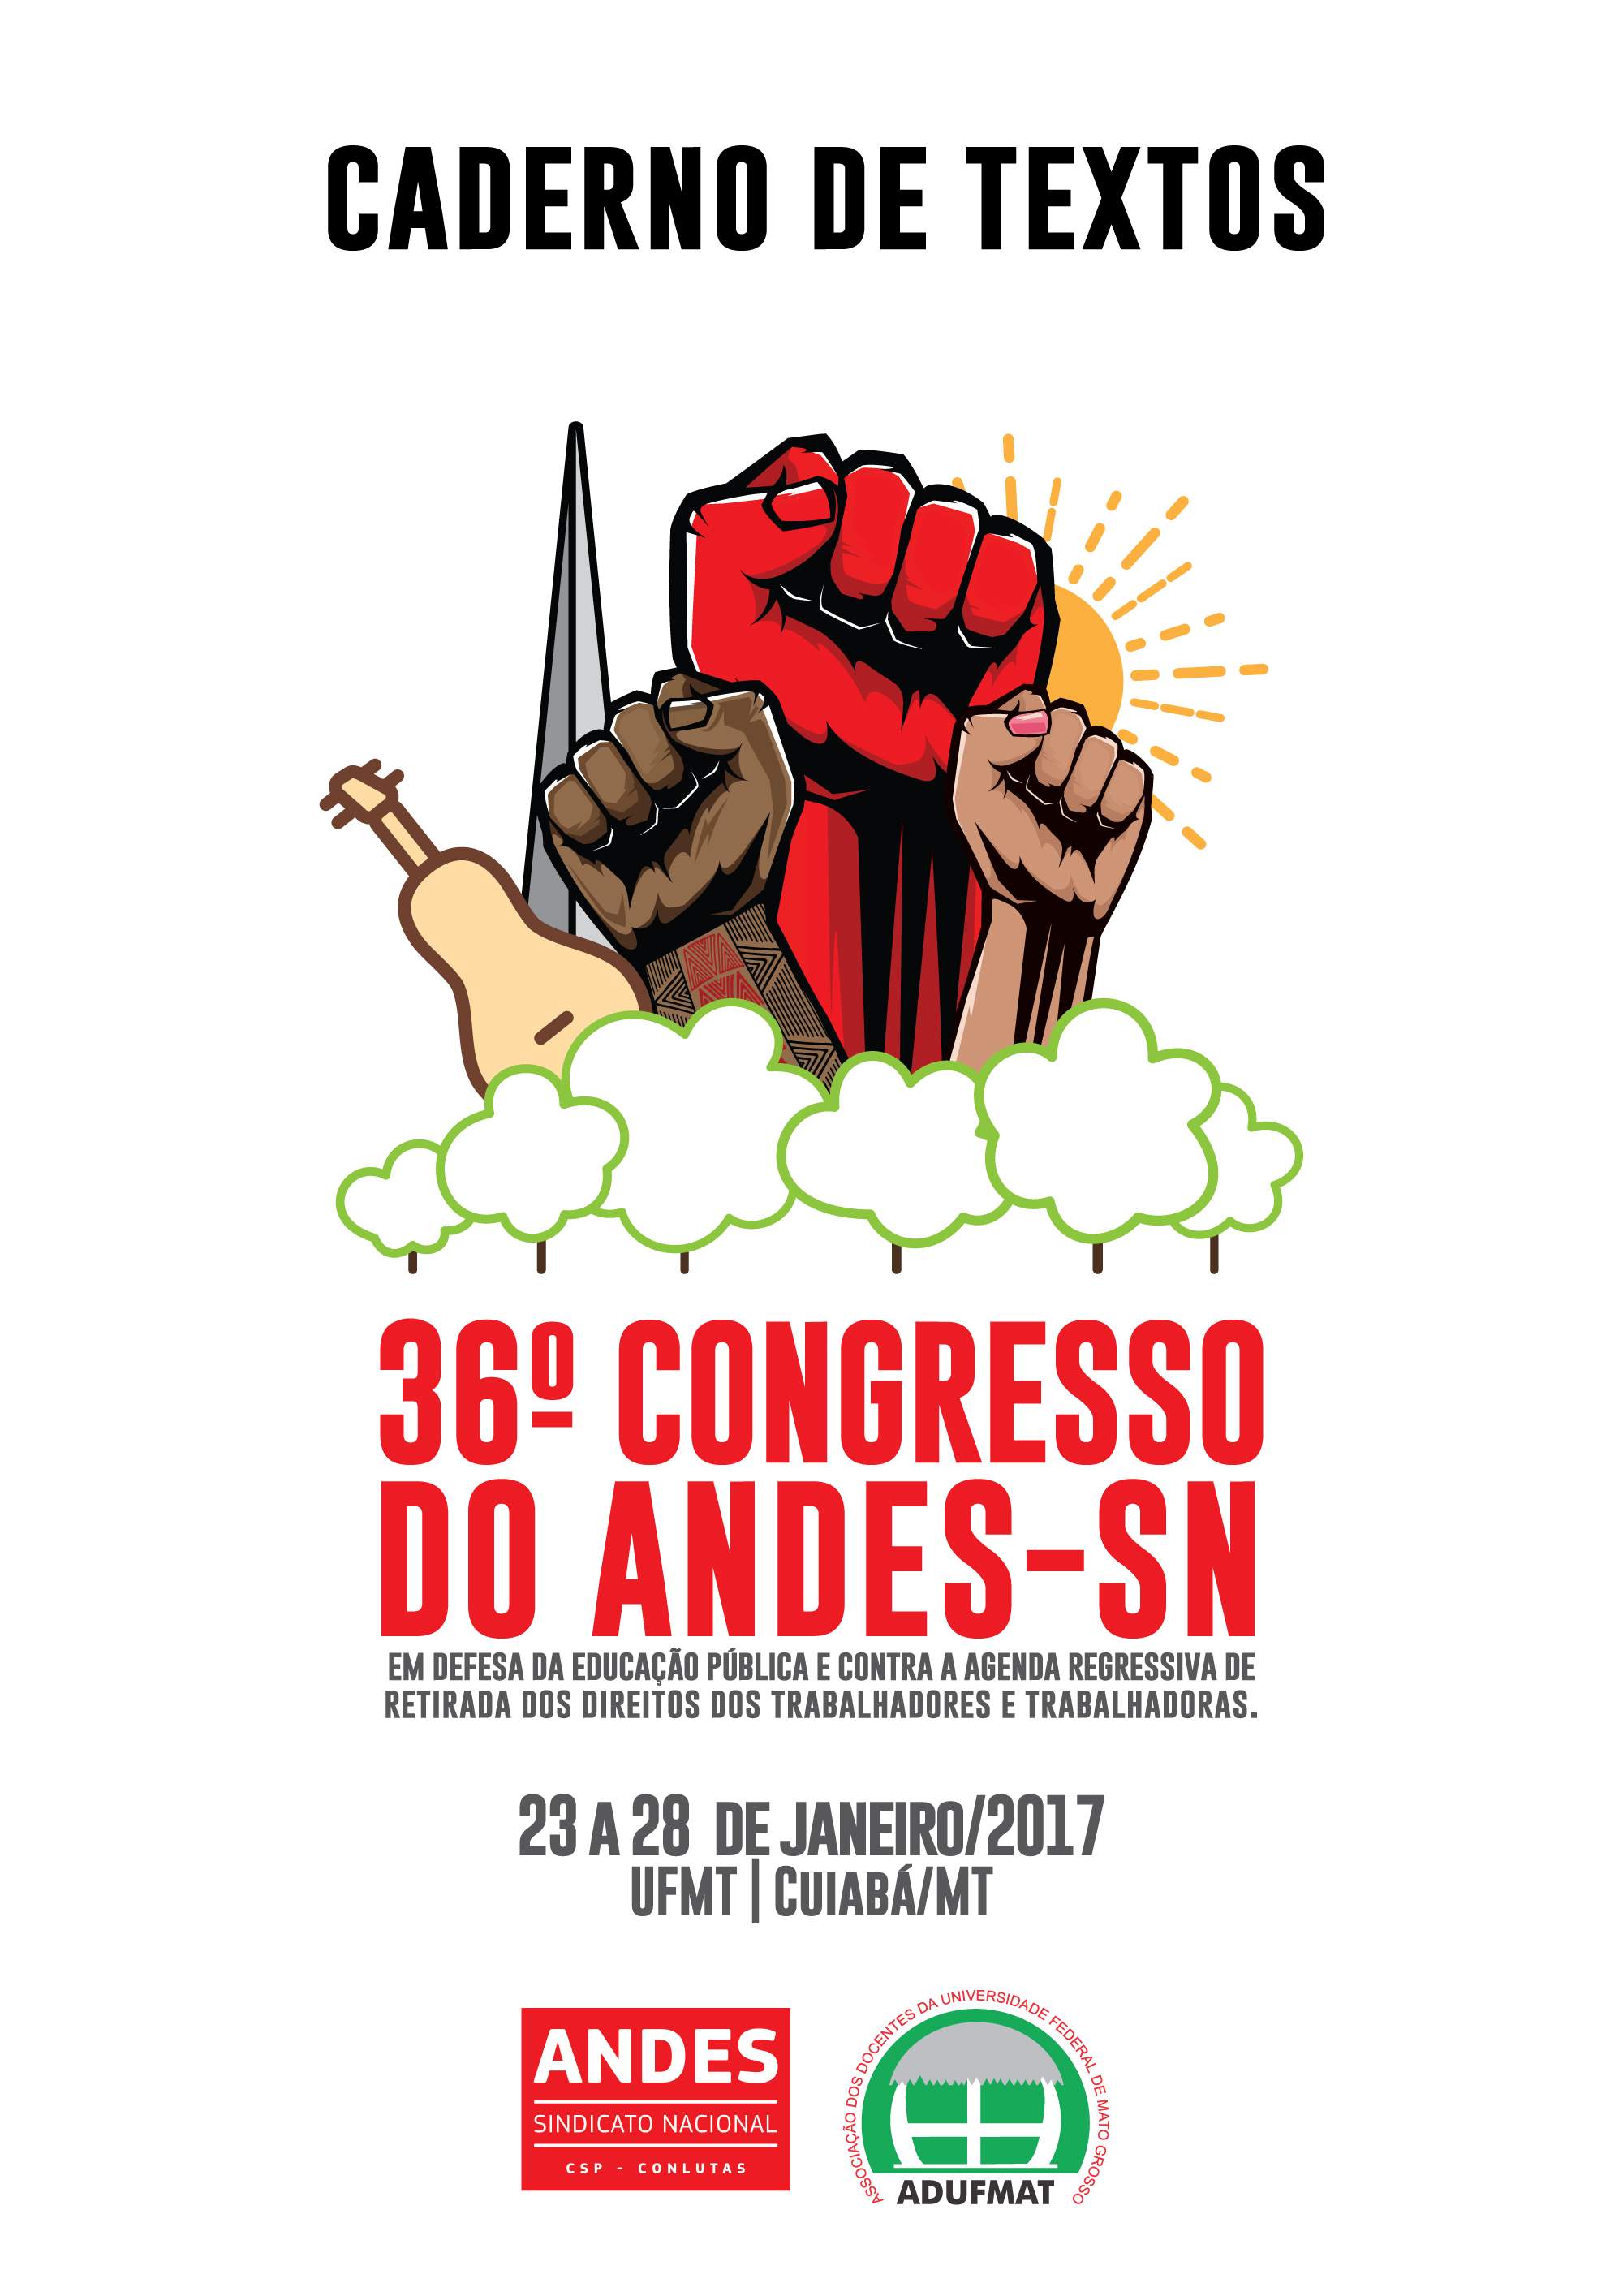 ANDES-SN divulga Caderno de Textos do 36º Congresso